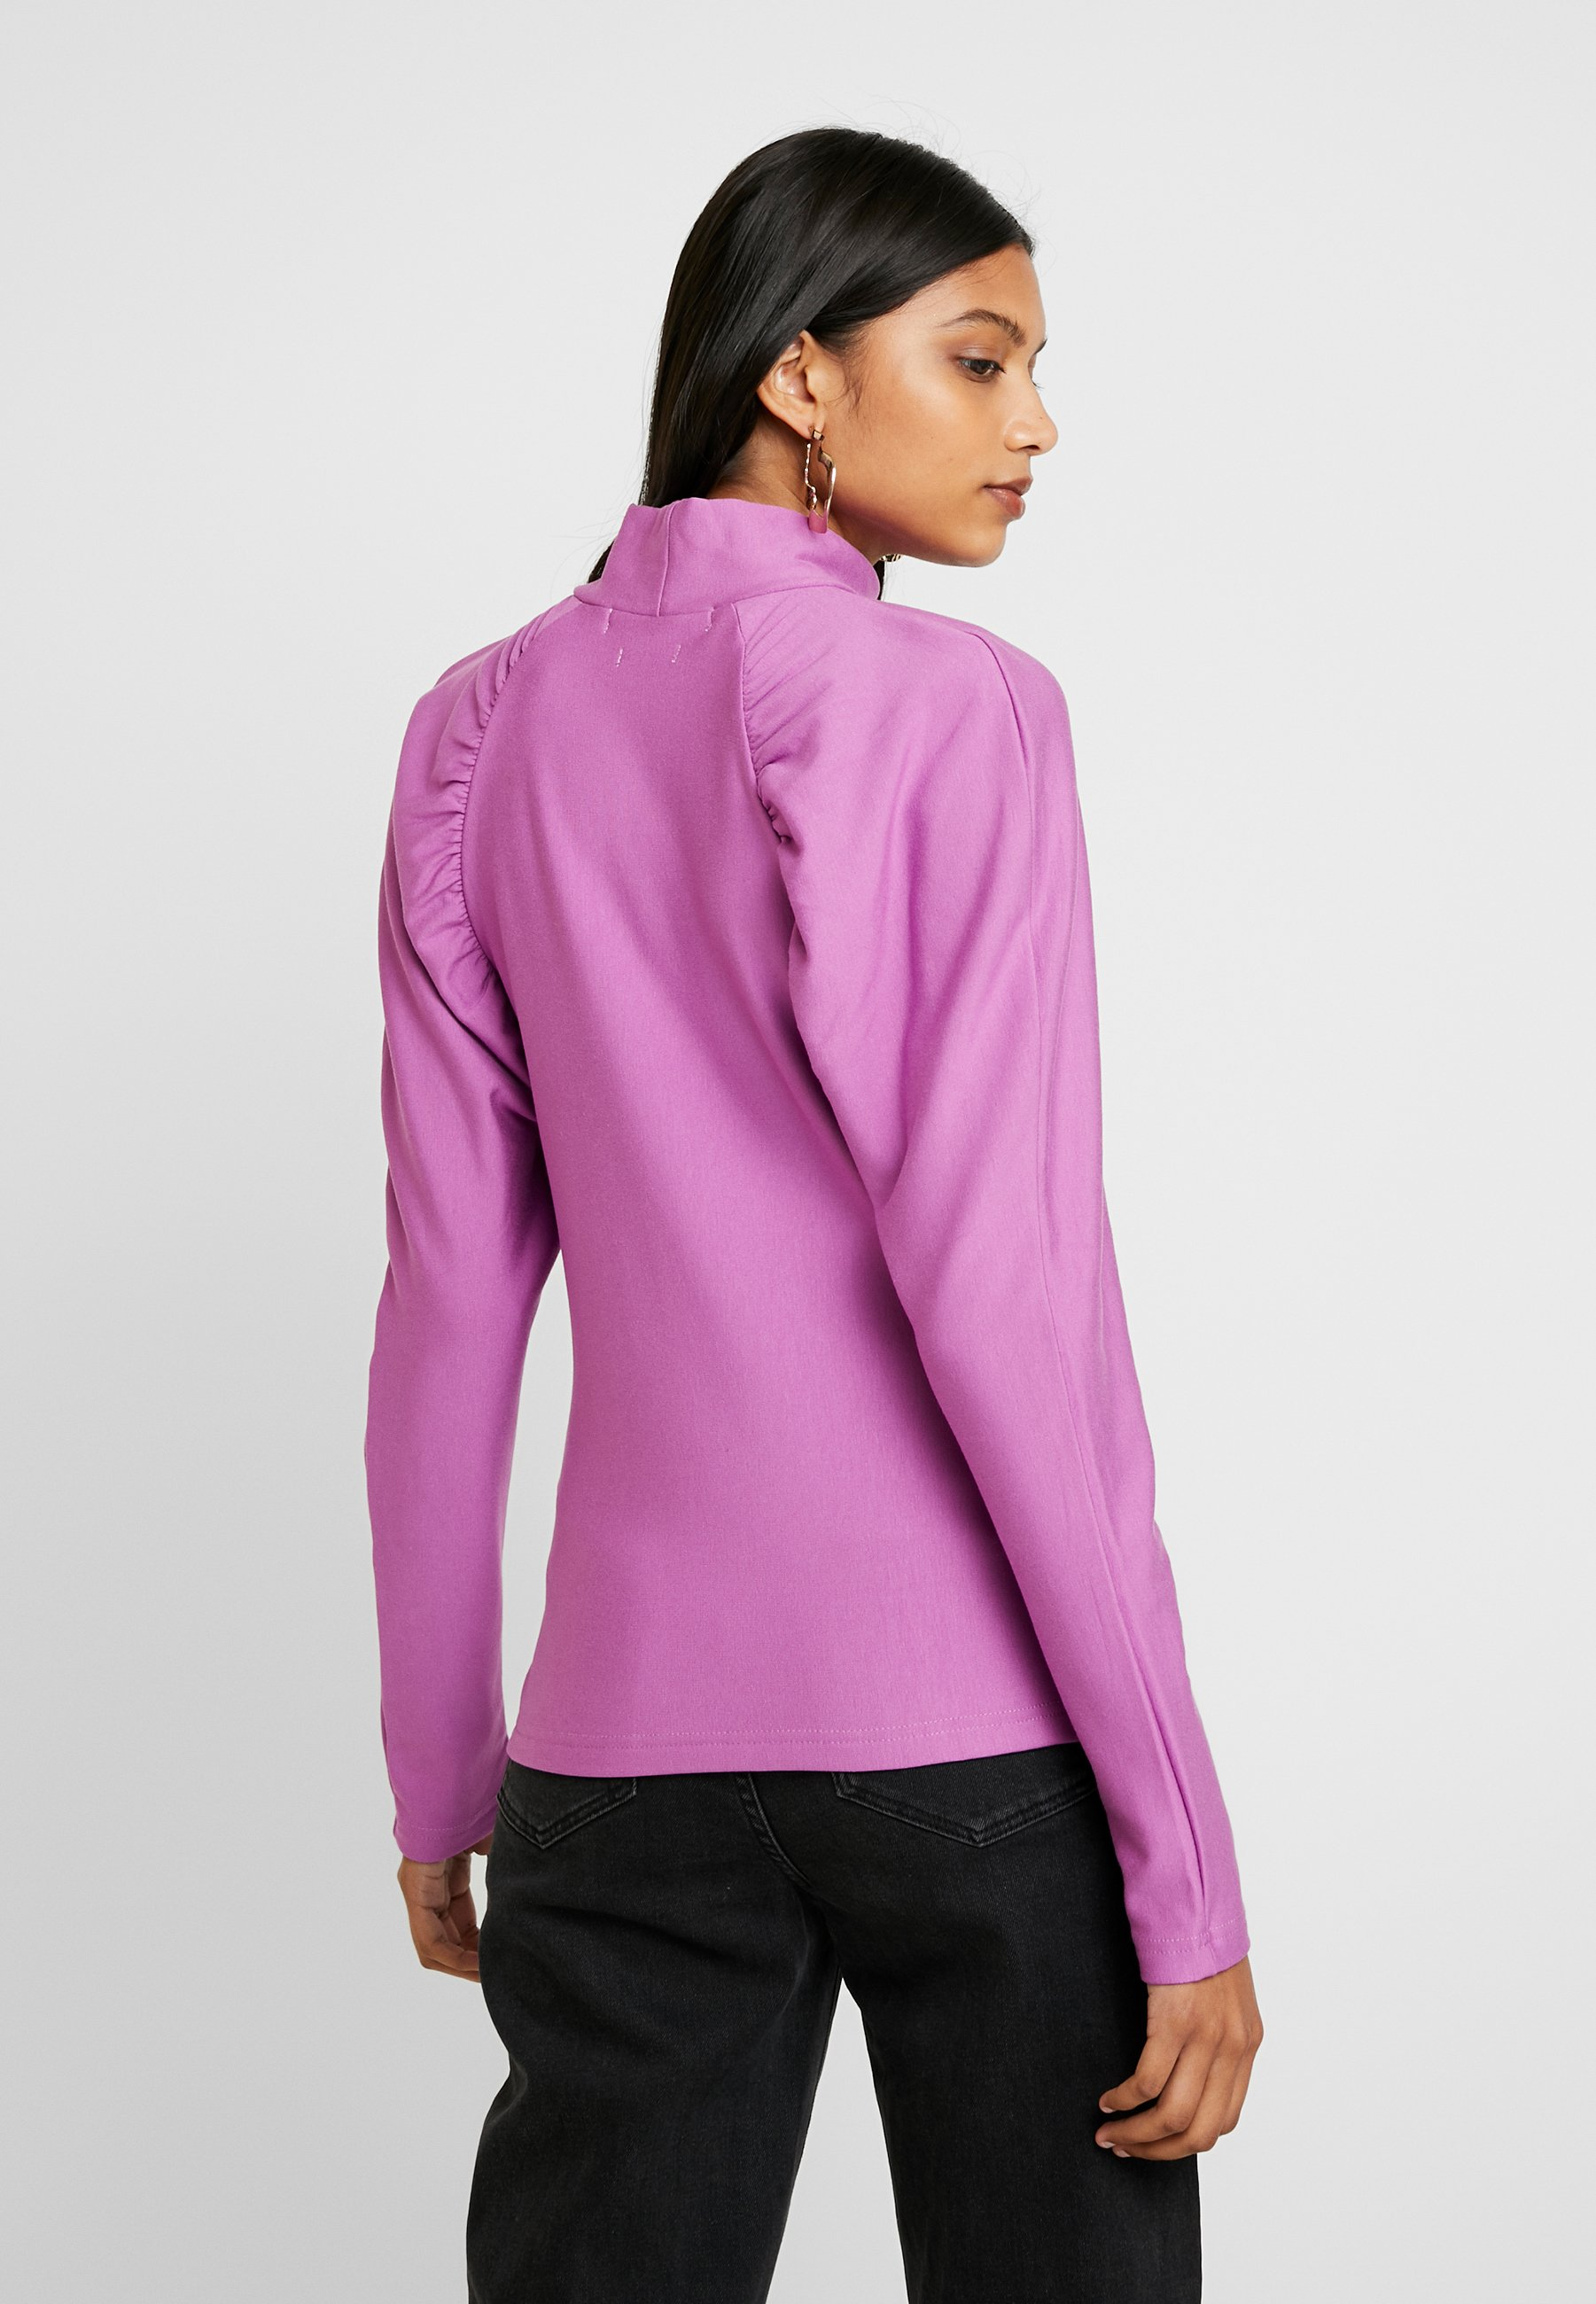 Gestuz TURTLENECK - Sweatshirt - iris orchid | Damenbekleidung billig